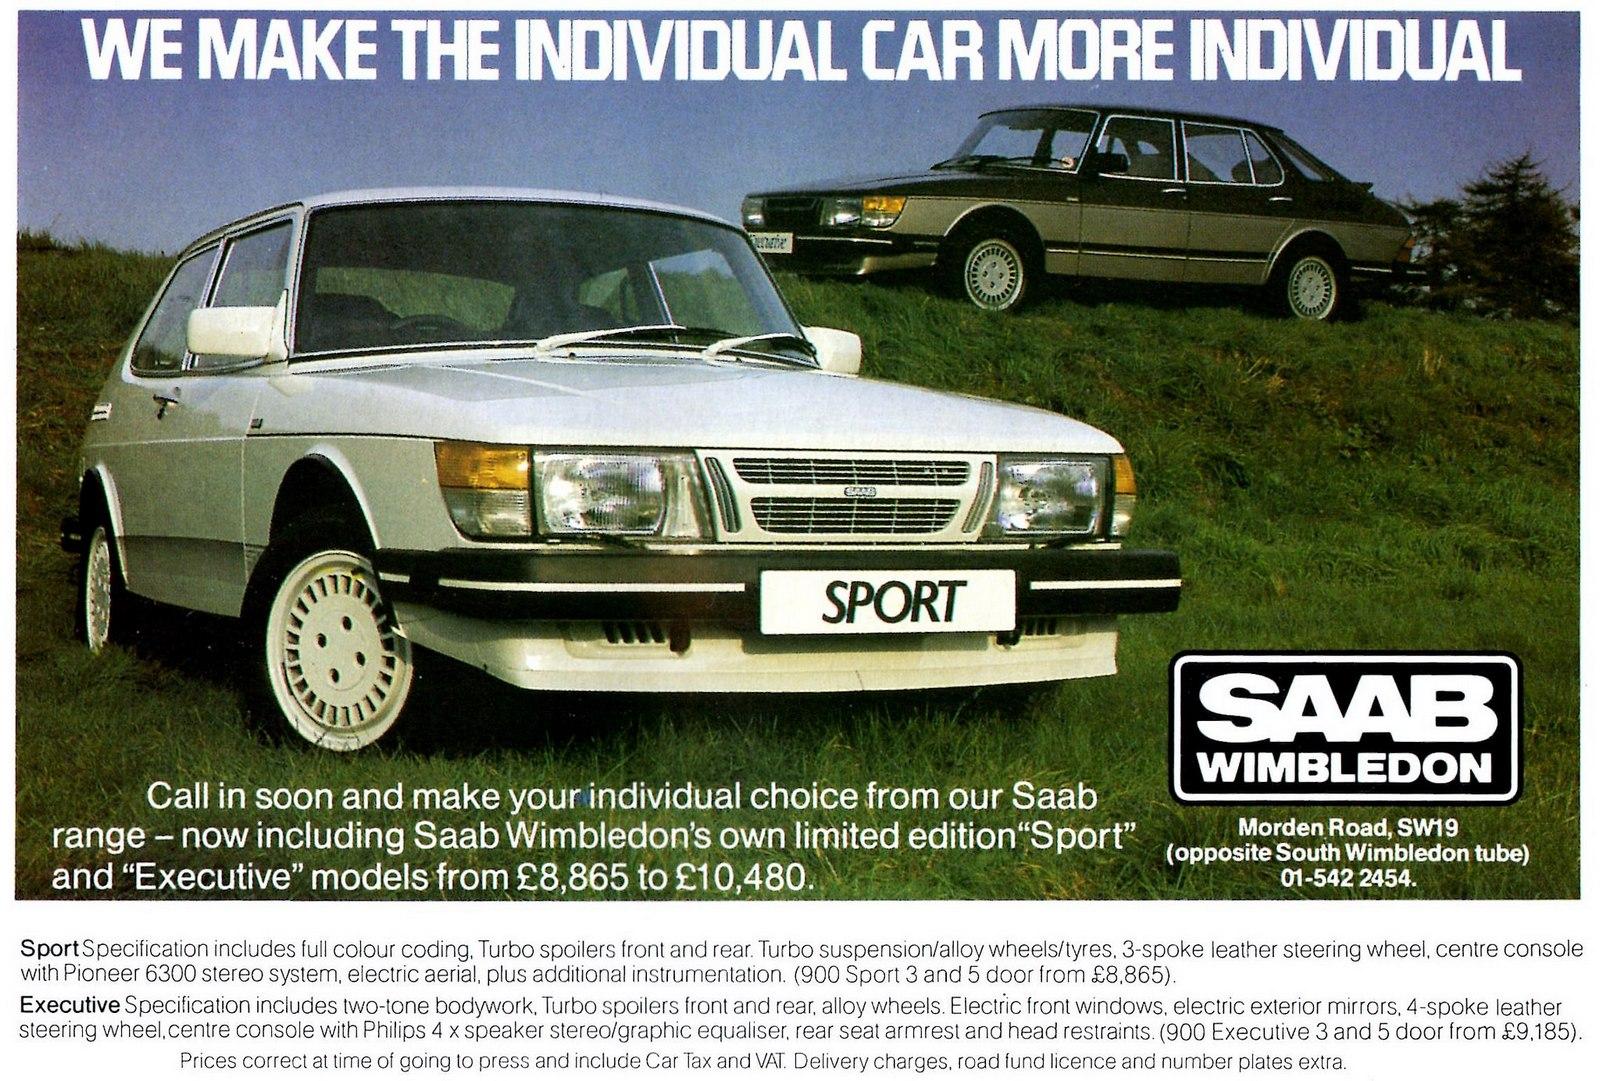 1984_saab_900_wimbledon_edition.jpg